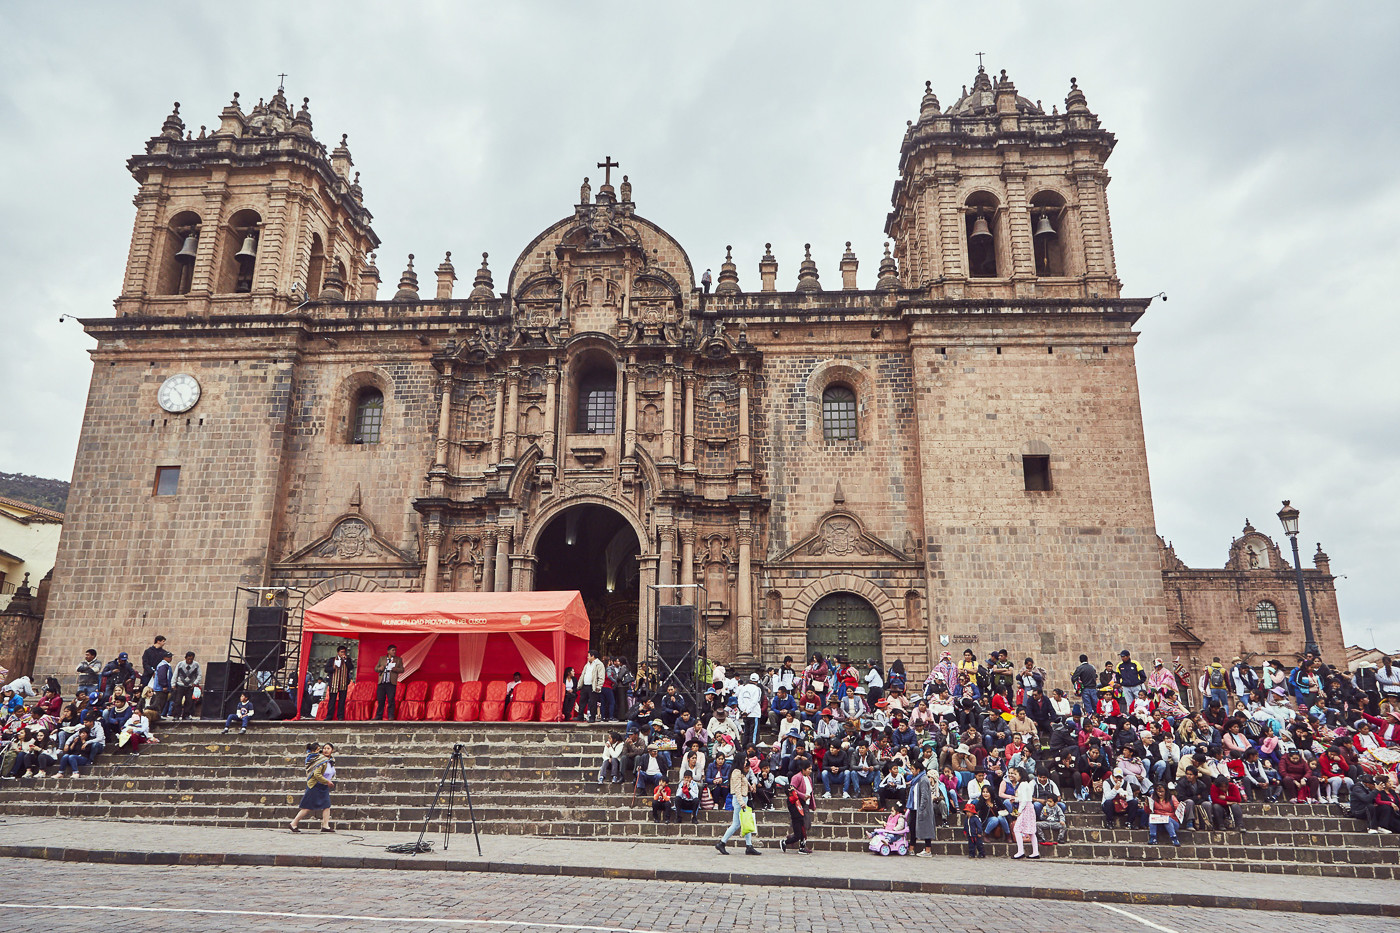 Feierlichkeiten zu Ehren des Señor de Huanca auf dem Plaza de Armas in Cusco